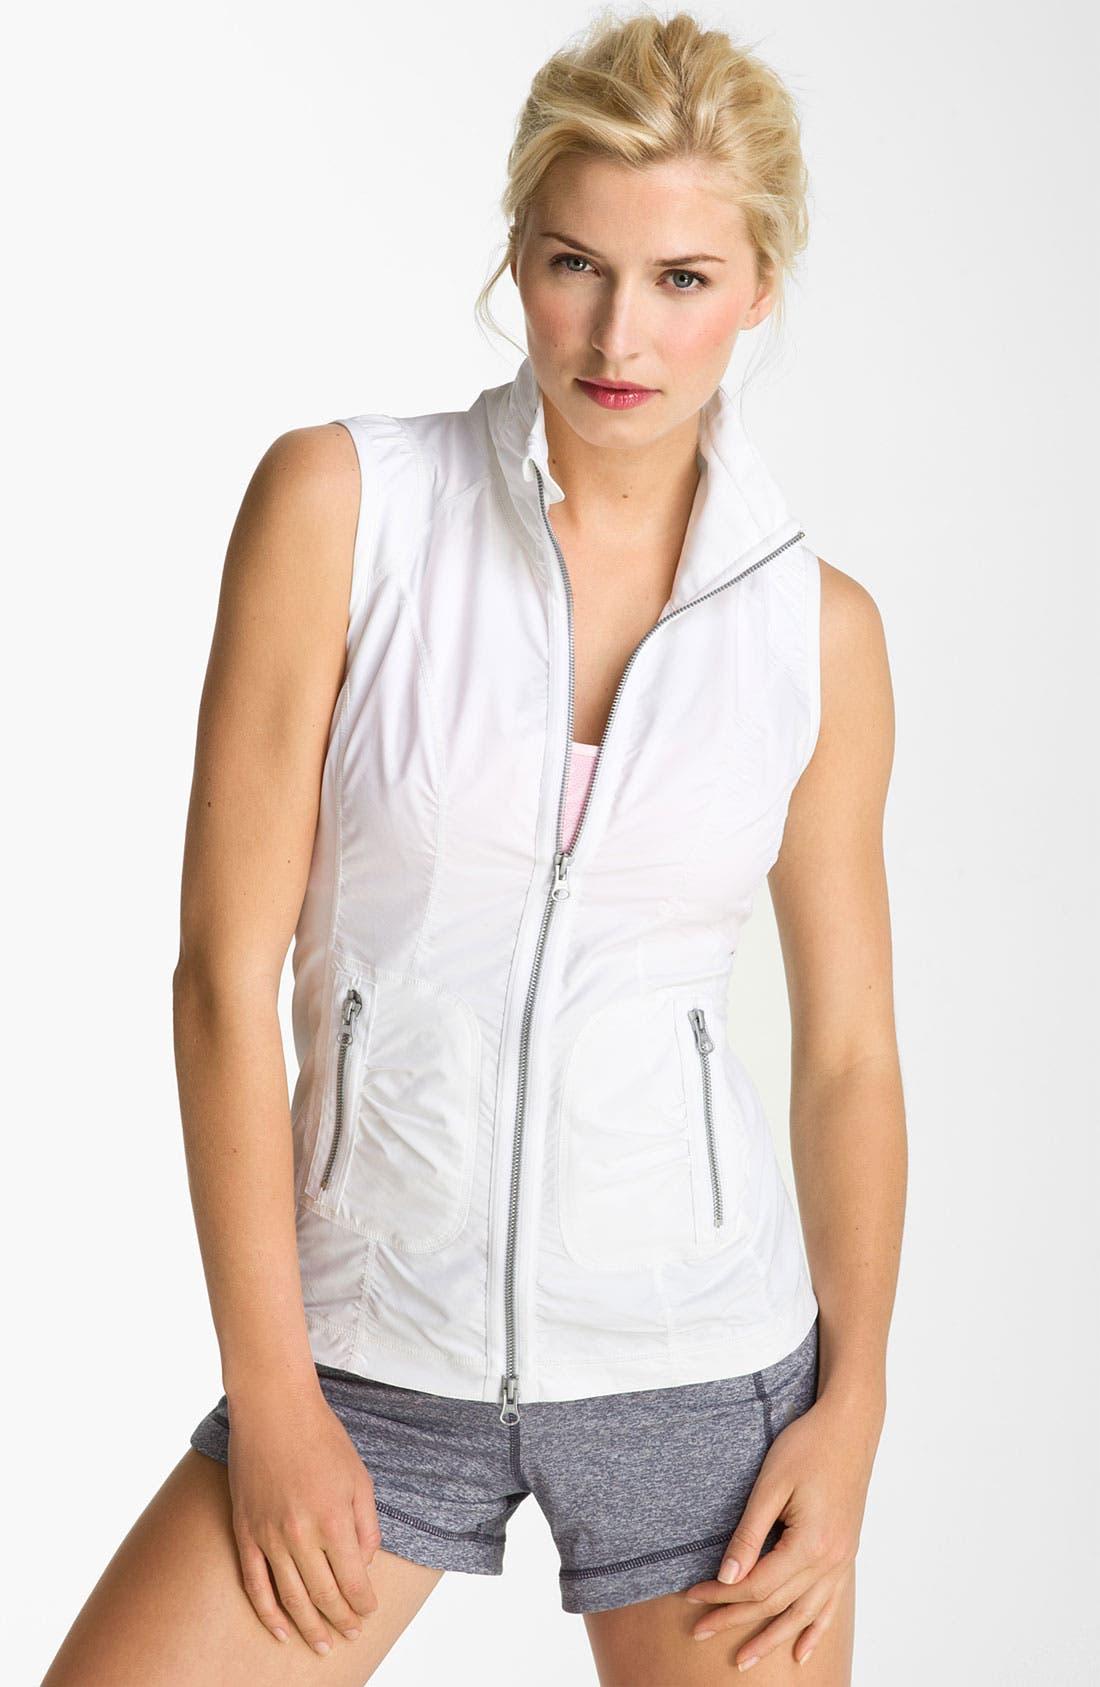 Alternate Image 1 Selected - Zella 'Move' Vest